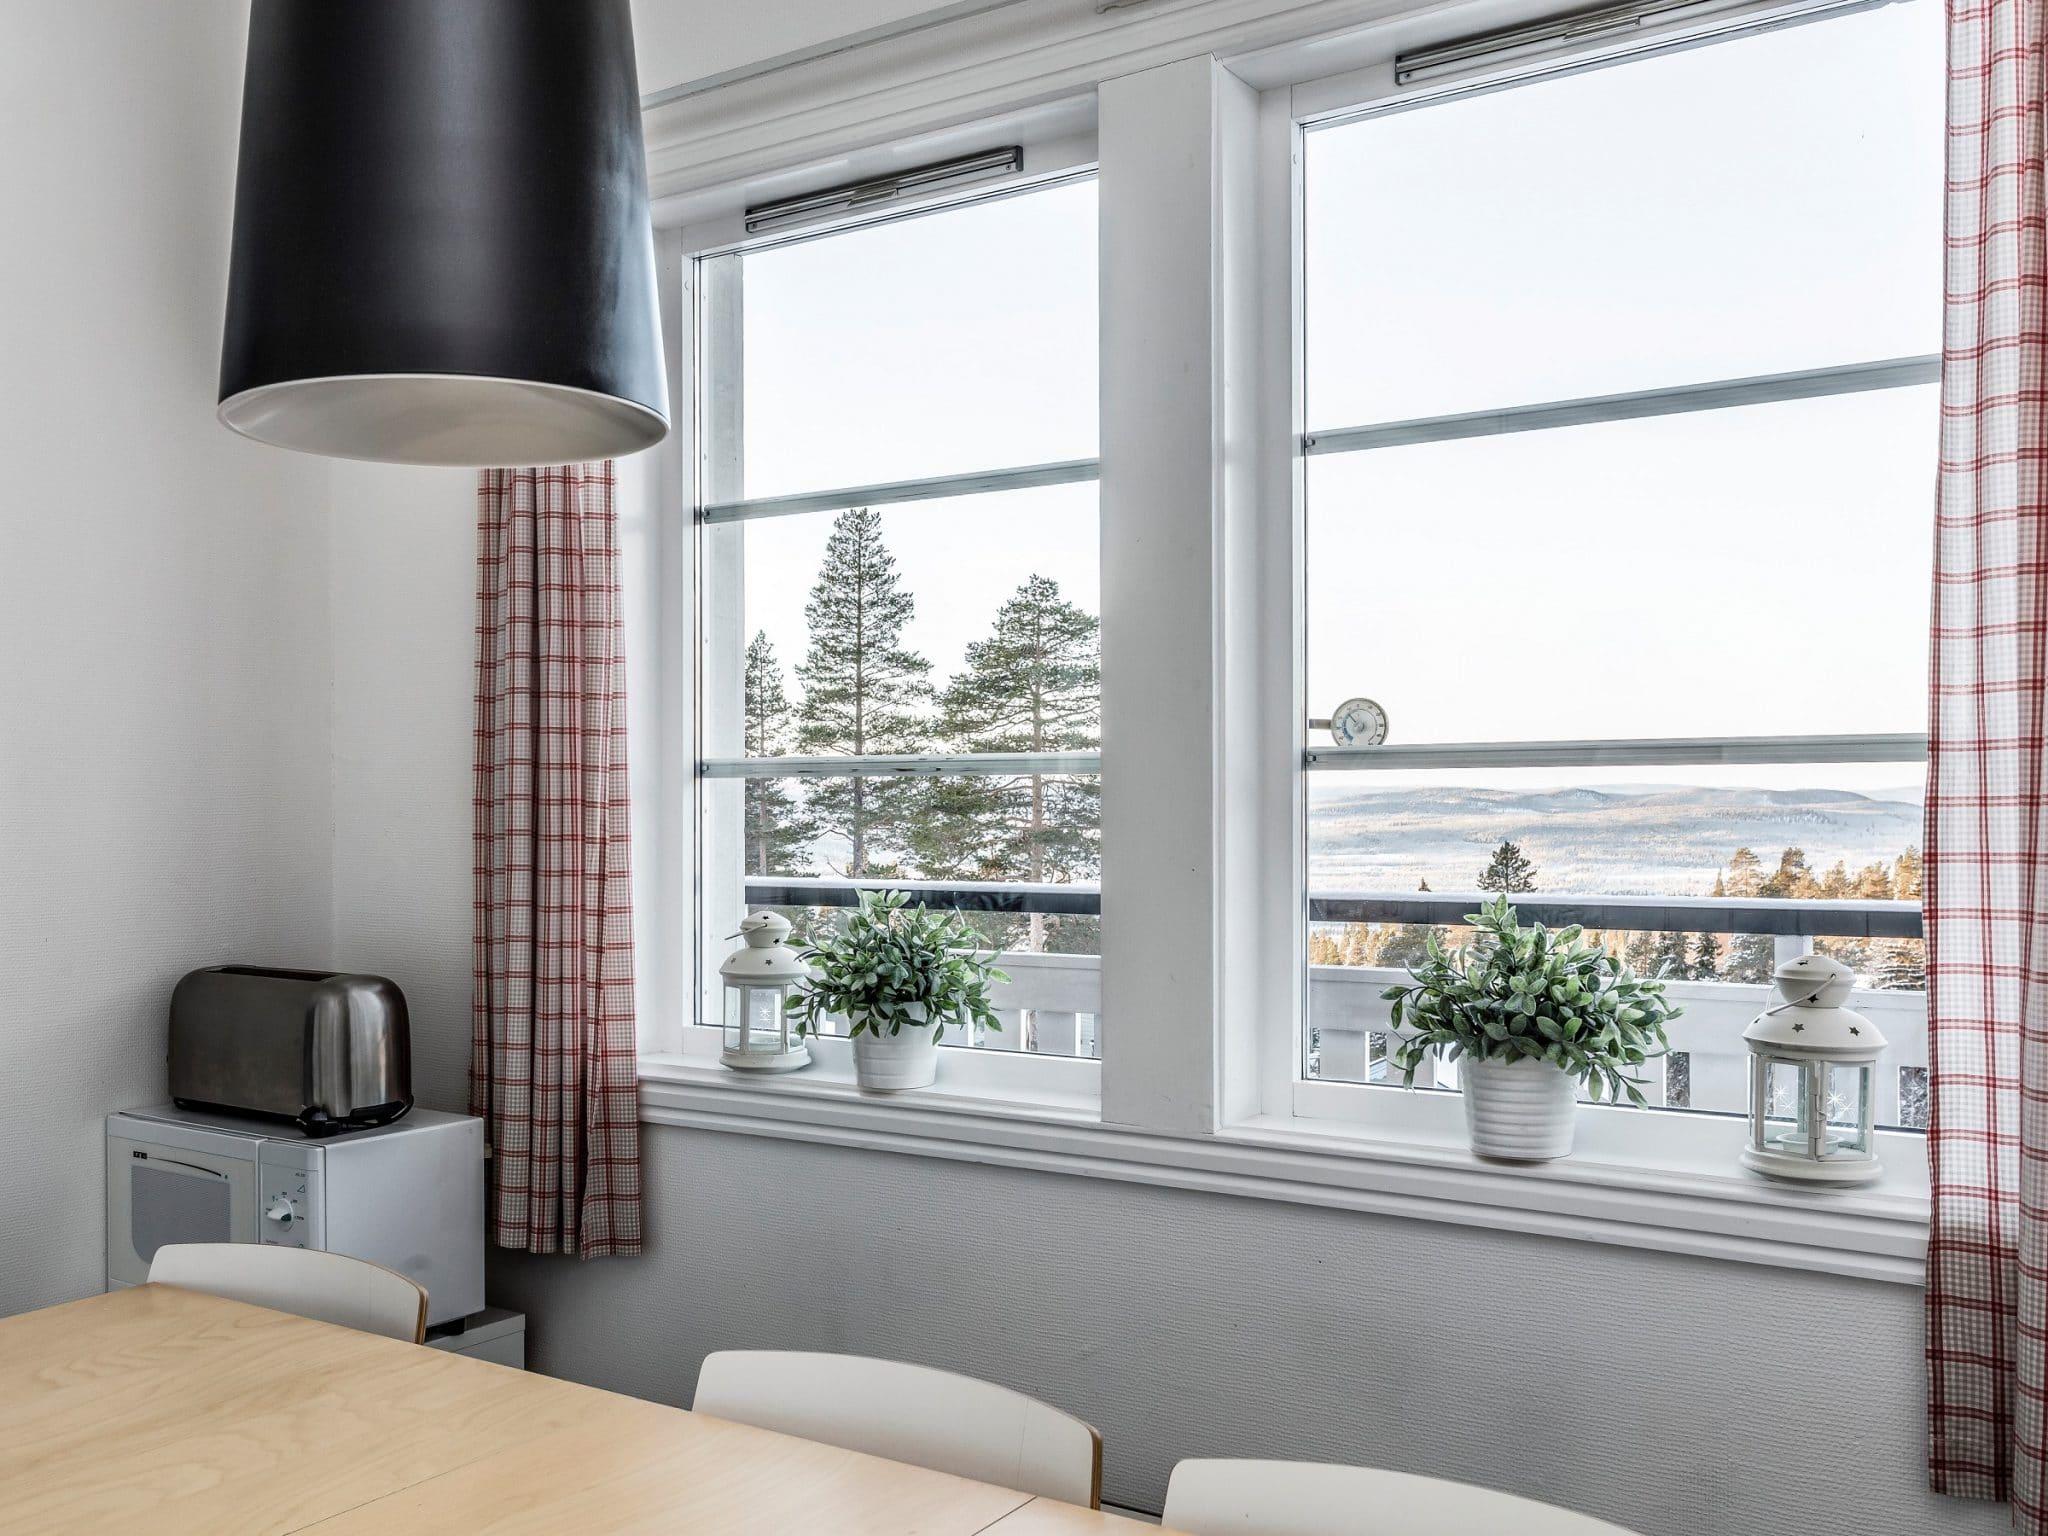 View from dining area in Blåbärskullen 3 in Vemdalen